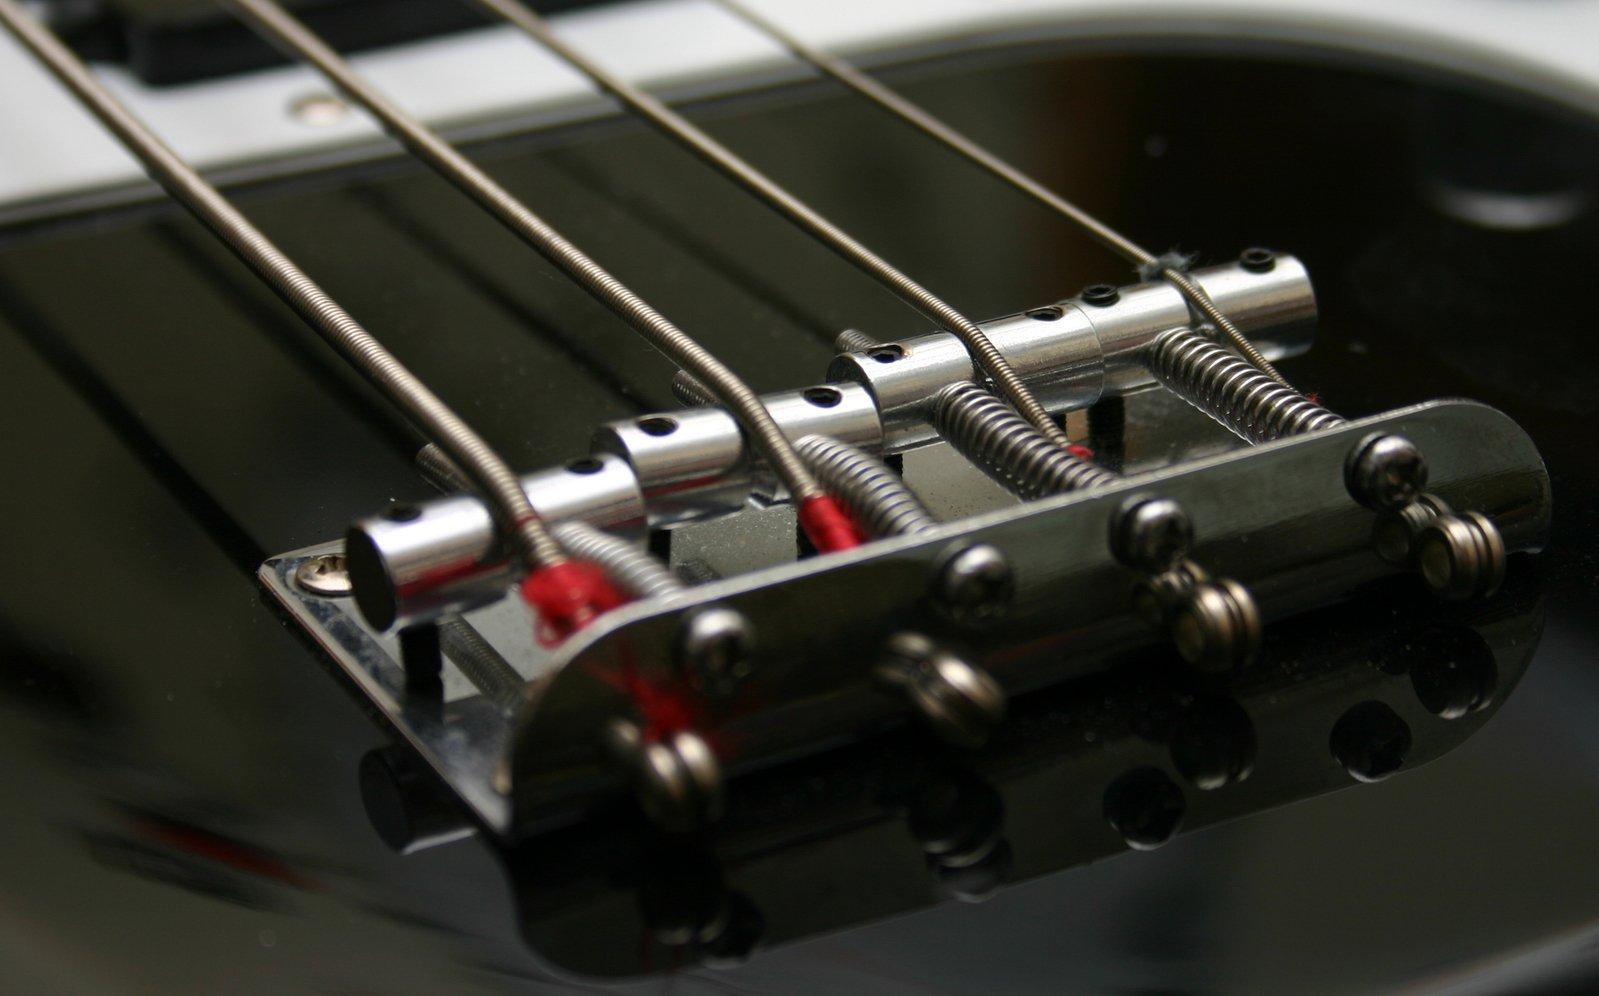 free bass guitar close up stock photo. Black Bedroom Furniture Sets. Home Design Ideas